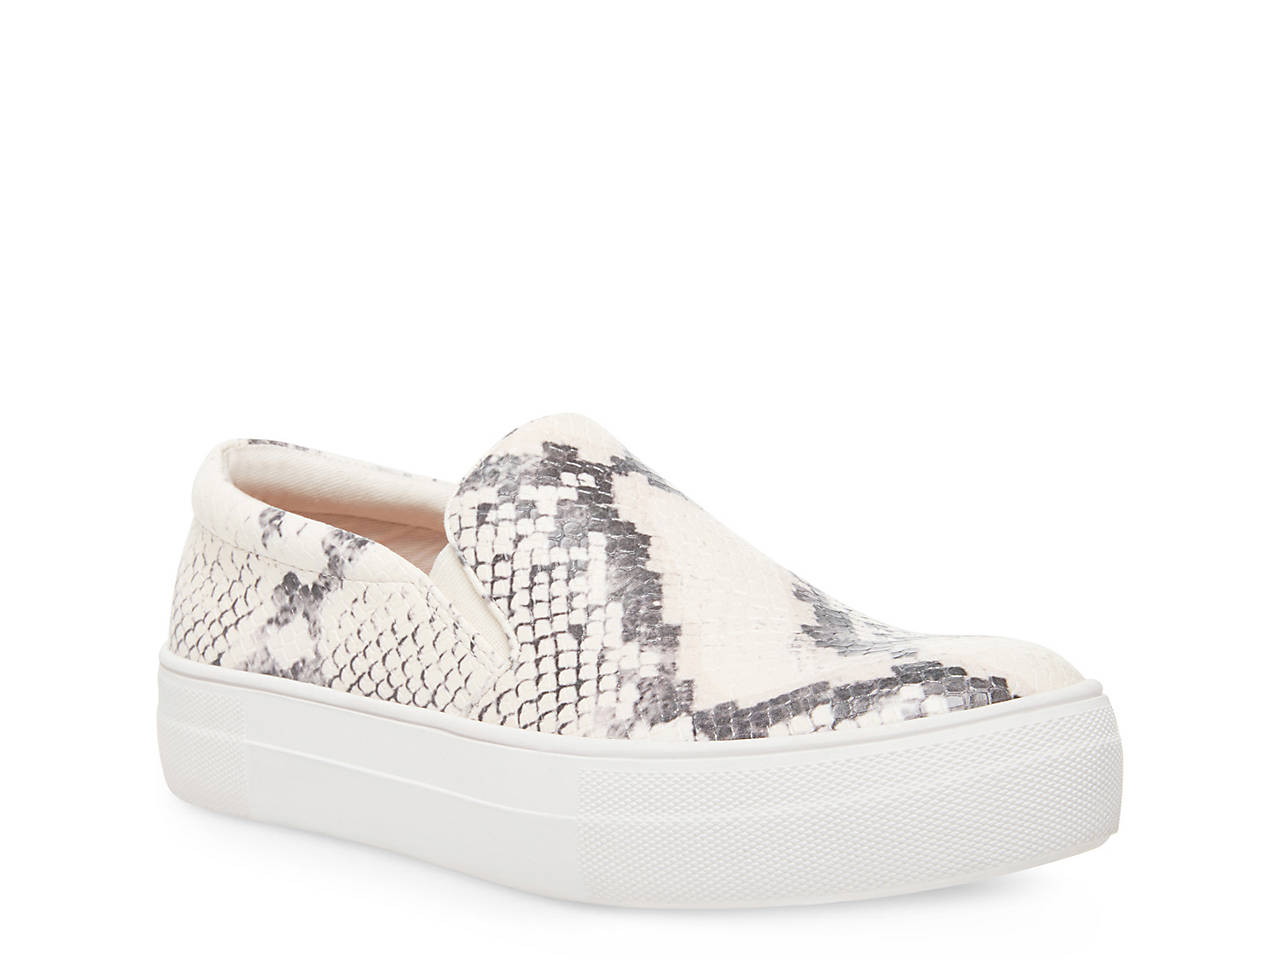 f4487c43831 Gills Platform Slip-On Sneaker